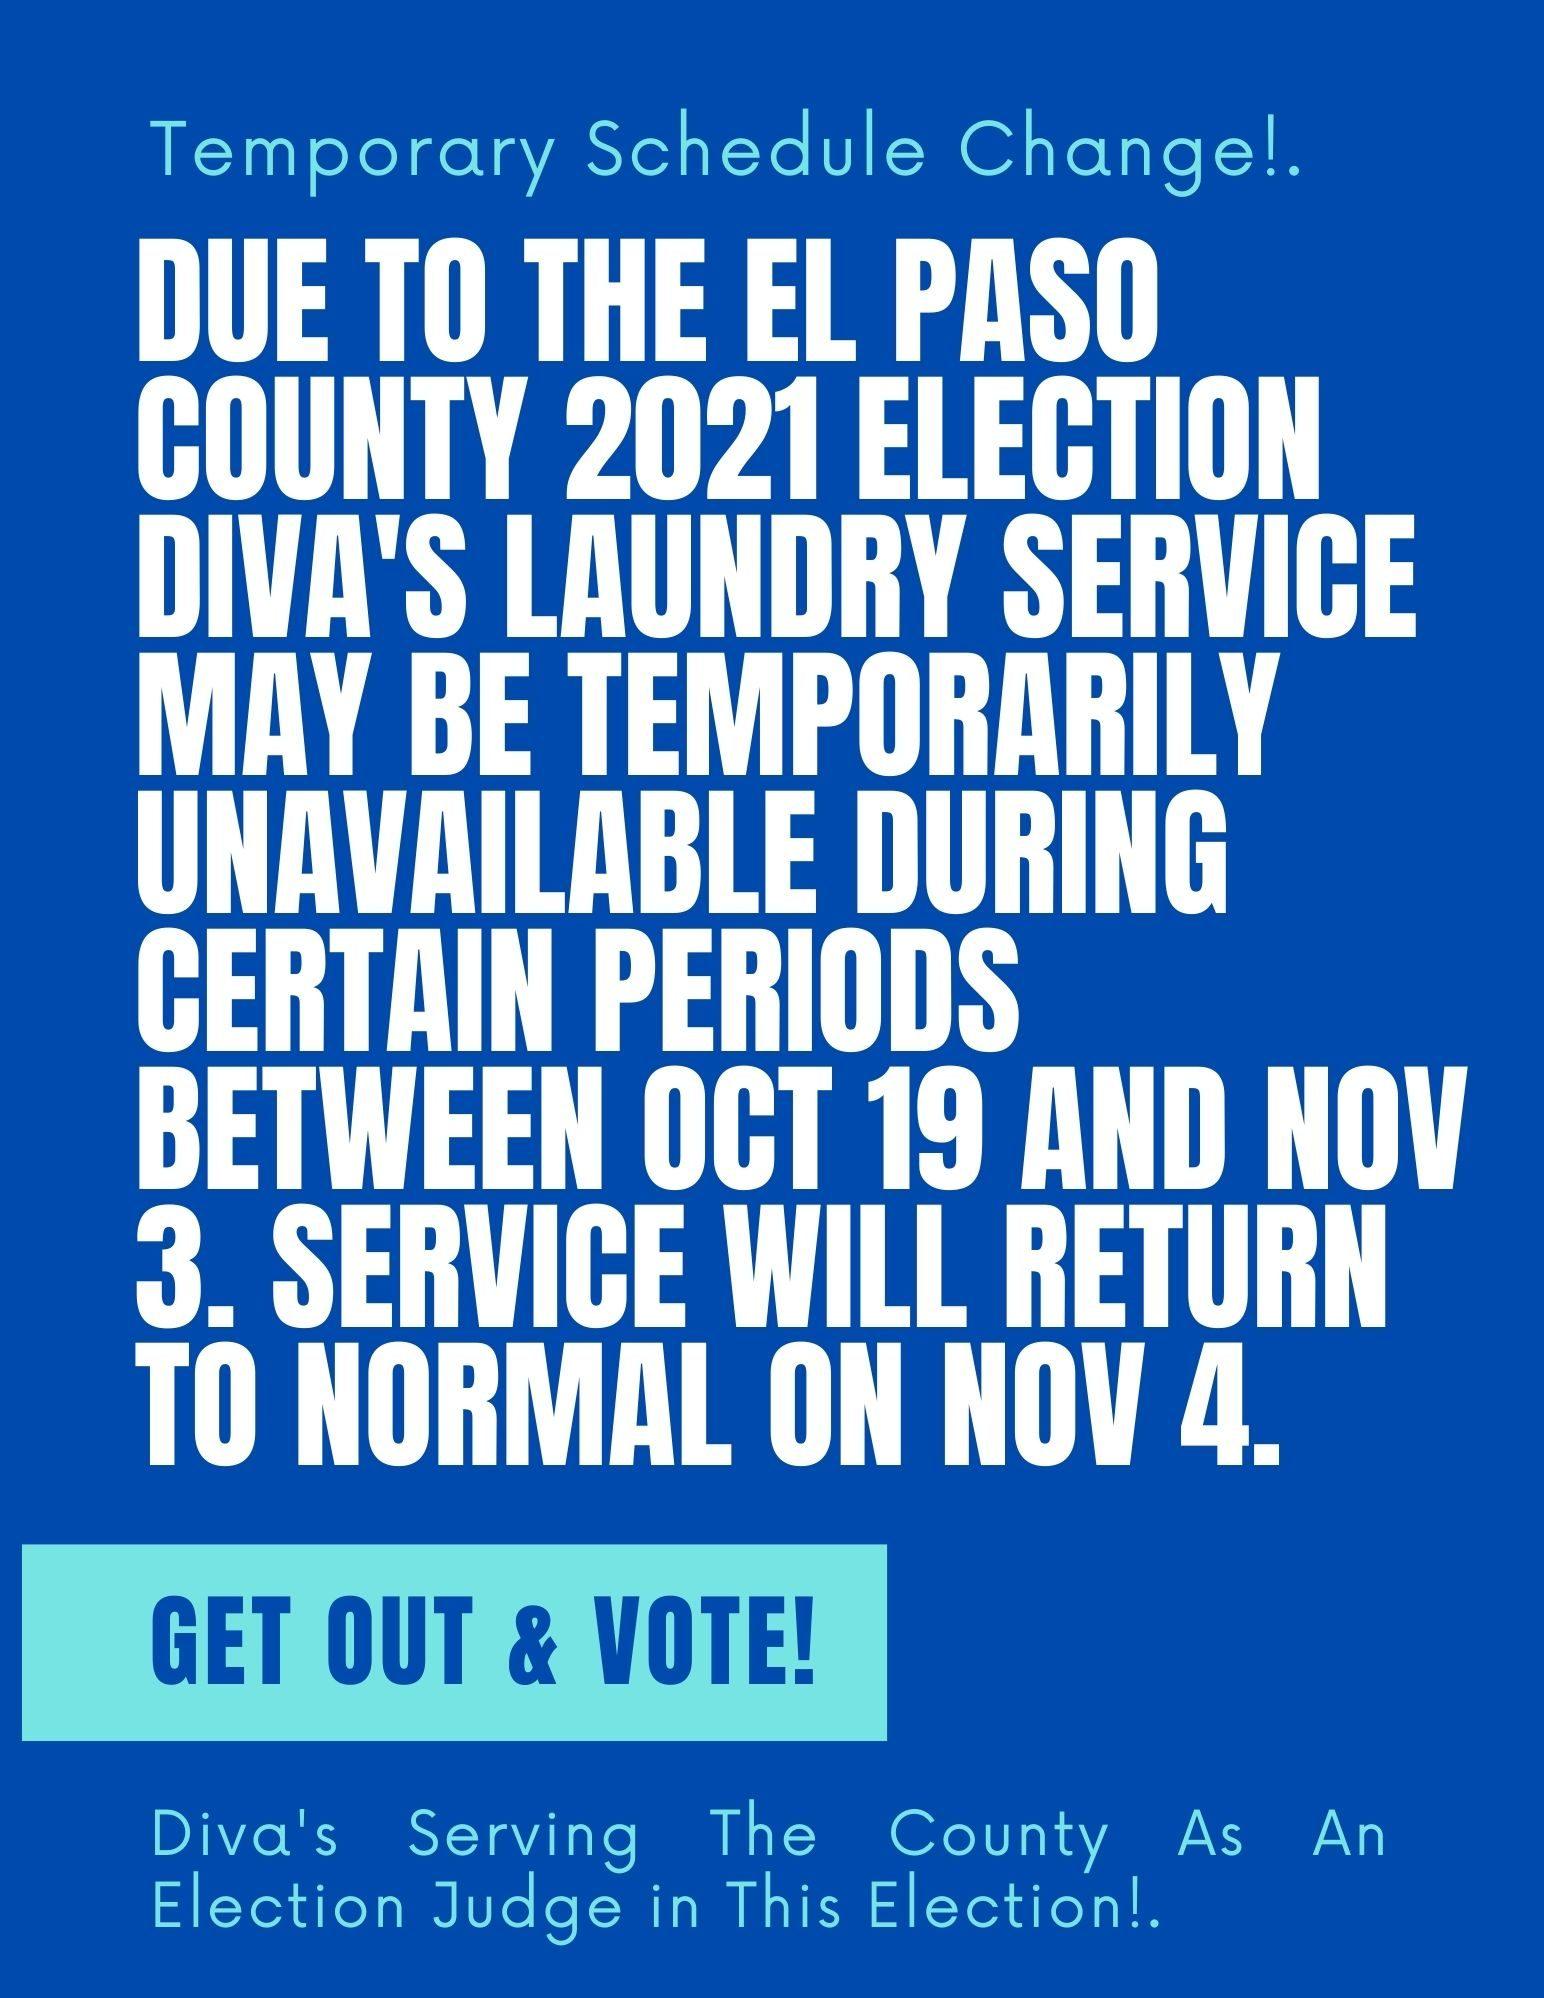 Diva's Laundry Service